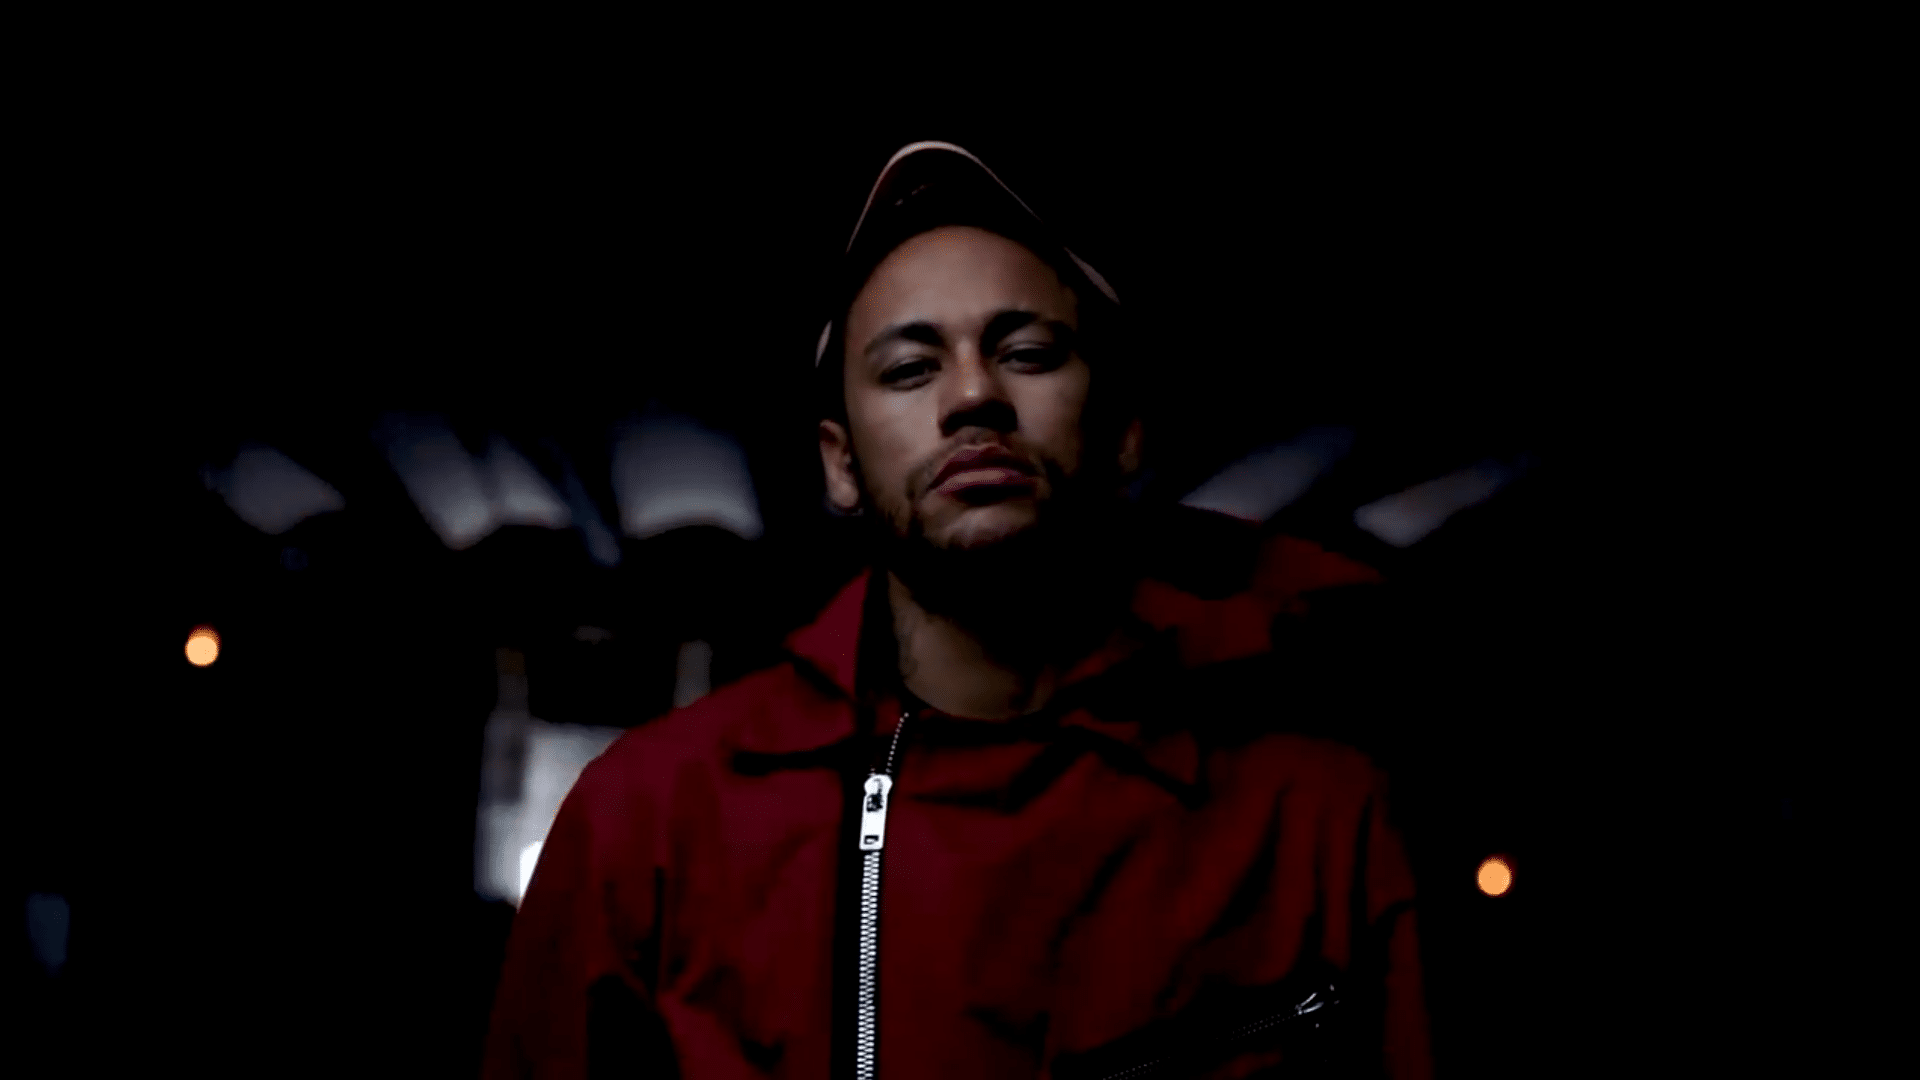 Neymar ne La casa di carta 3, Netflix l'aveva rimosso ...